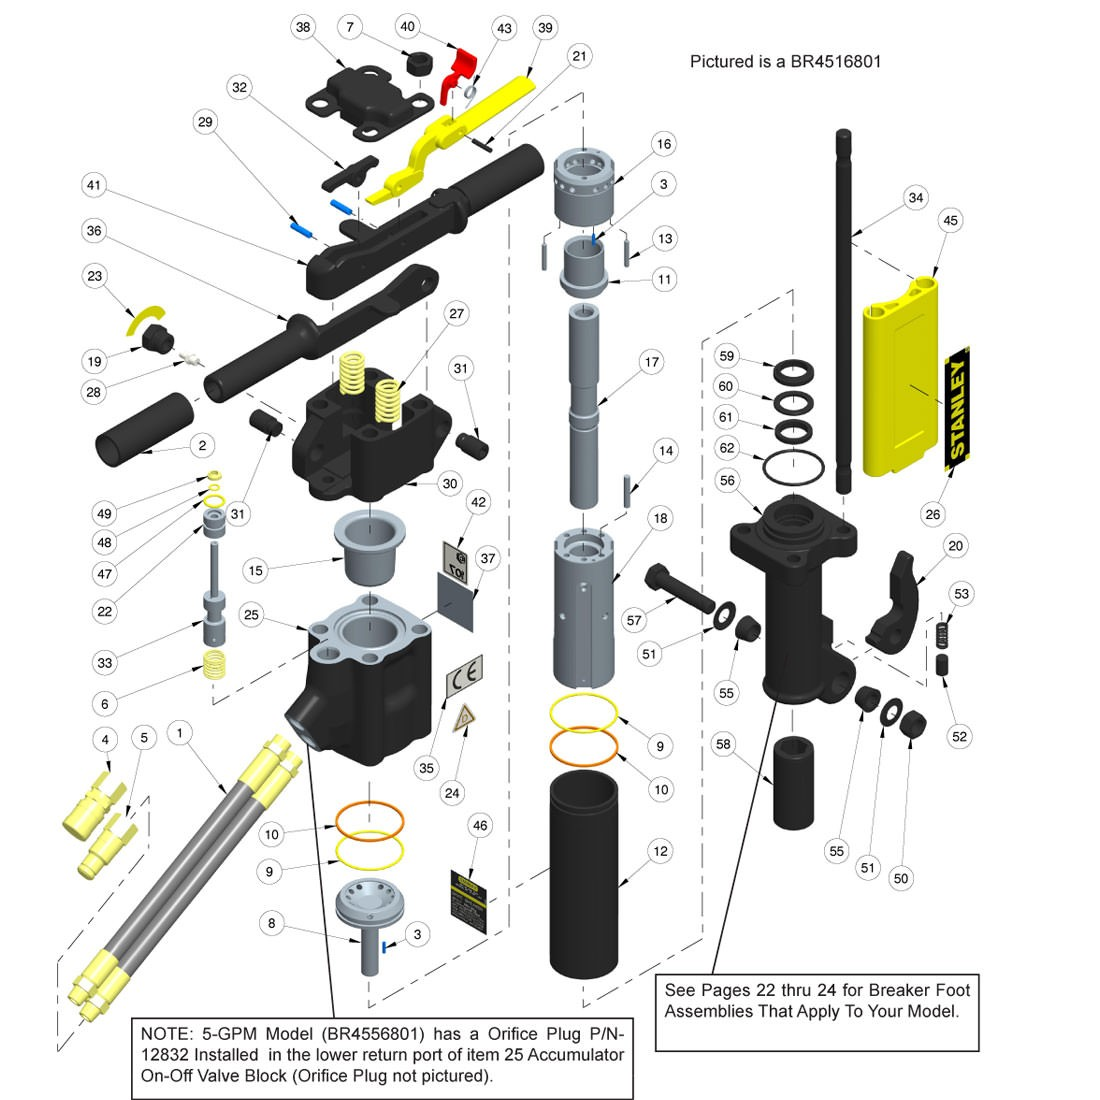 Stanley BR45 Anti-Vibration Handle Parts Illustration